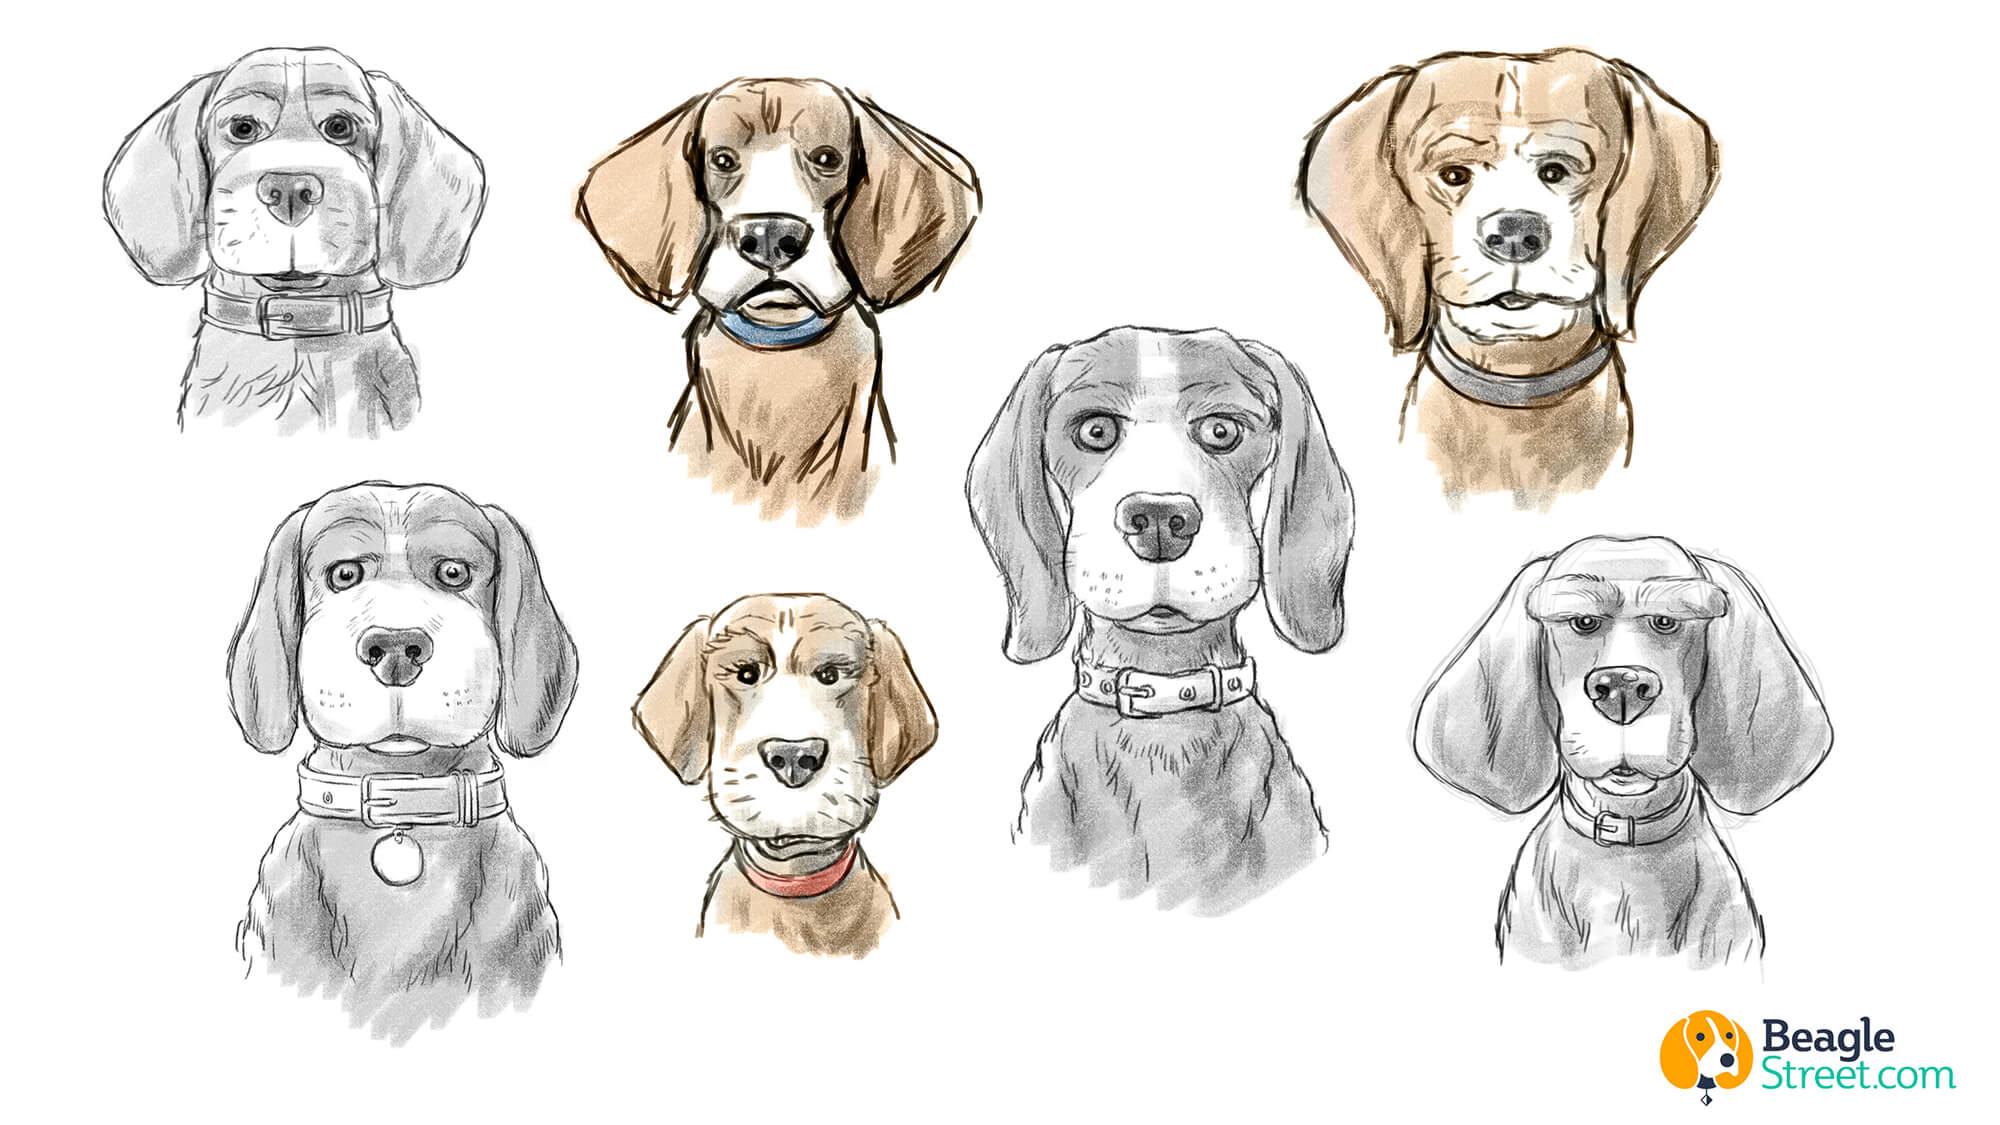 Beagle_Character_Design_5.jpg